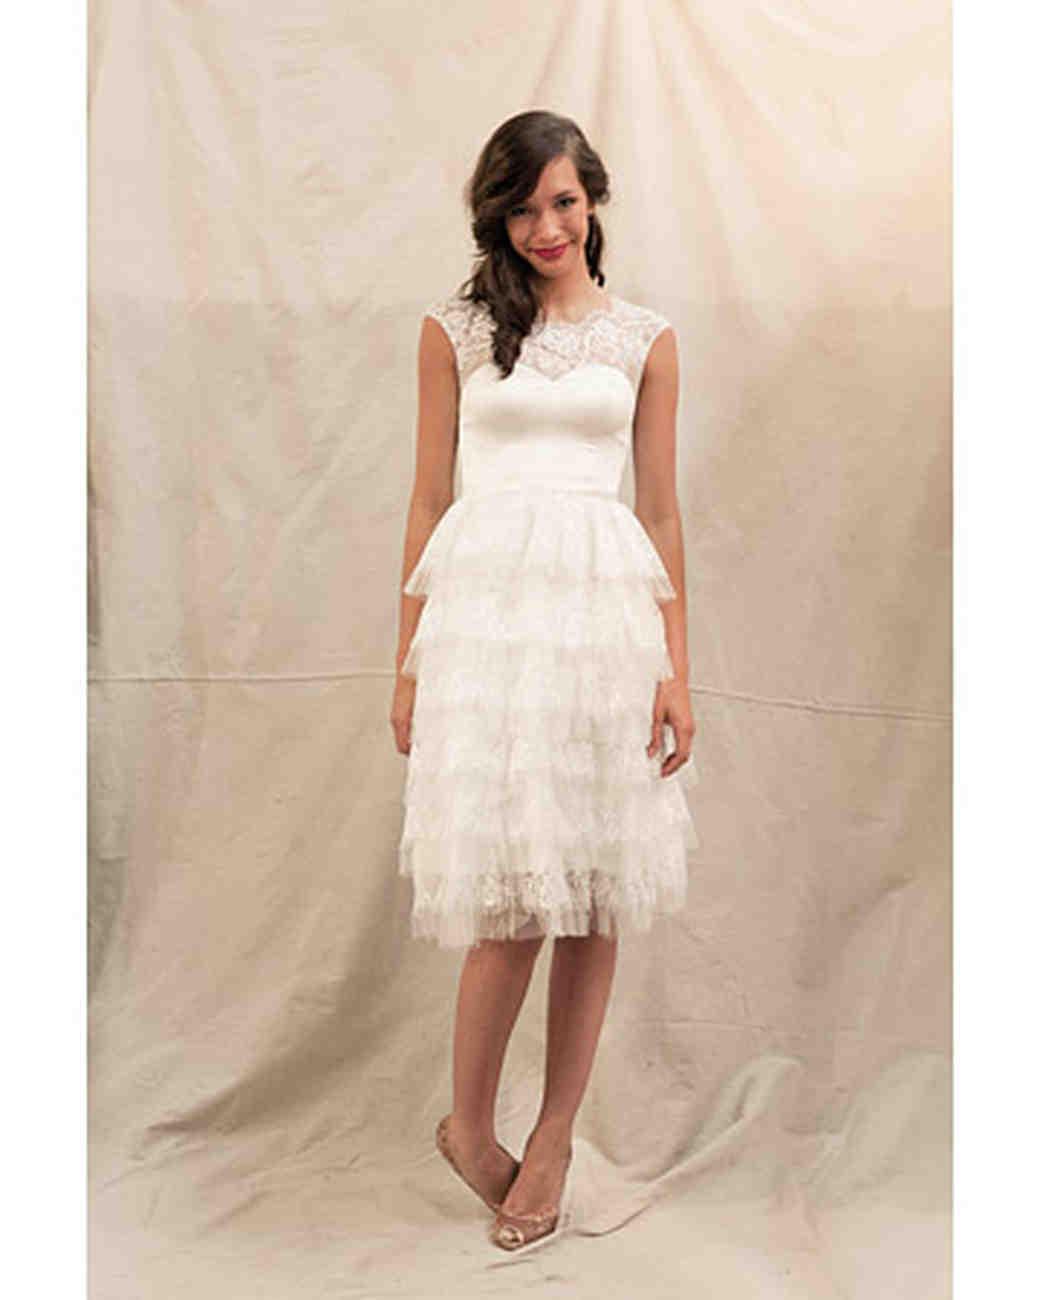 Modern Lace Wedding Dresses from Spring 2012 Bridal Fashion Week ...